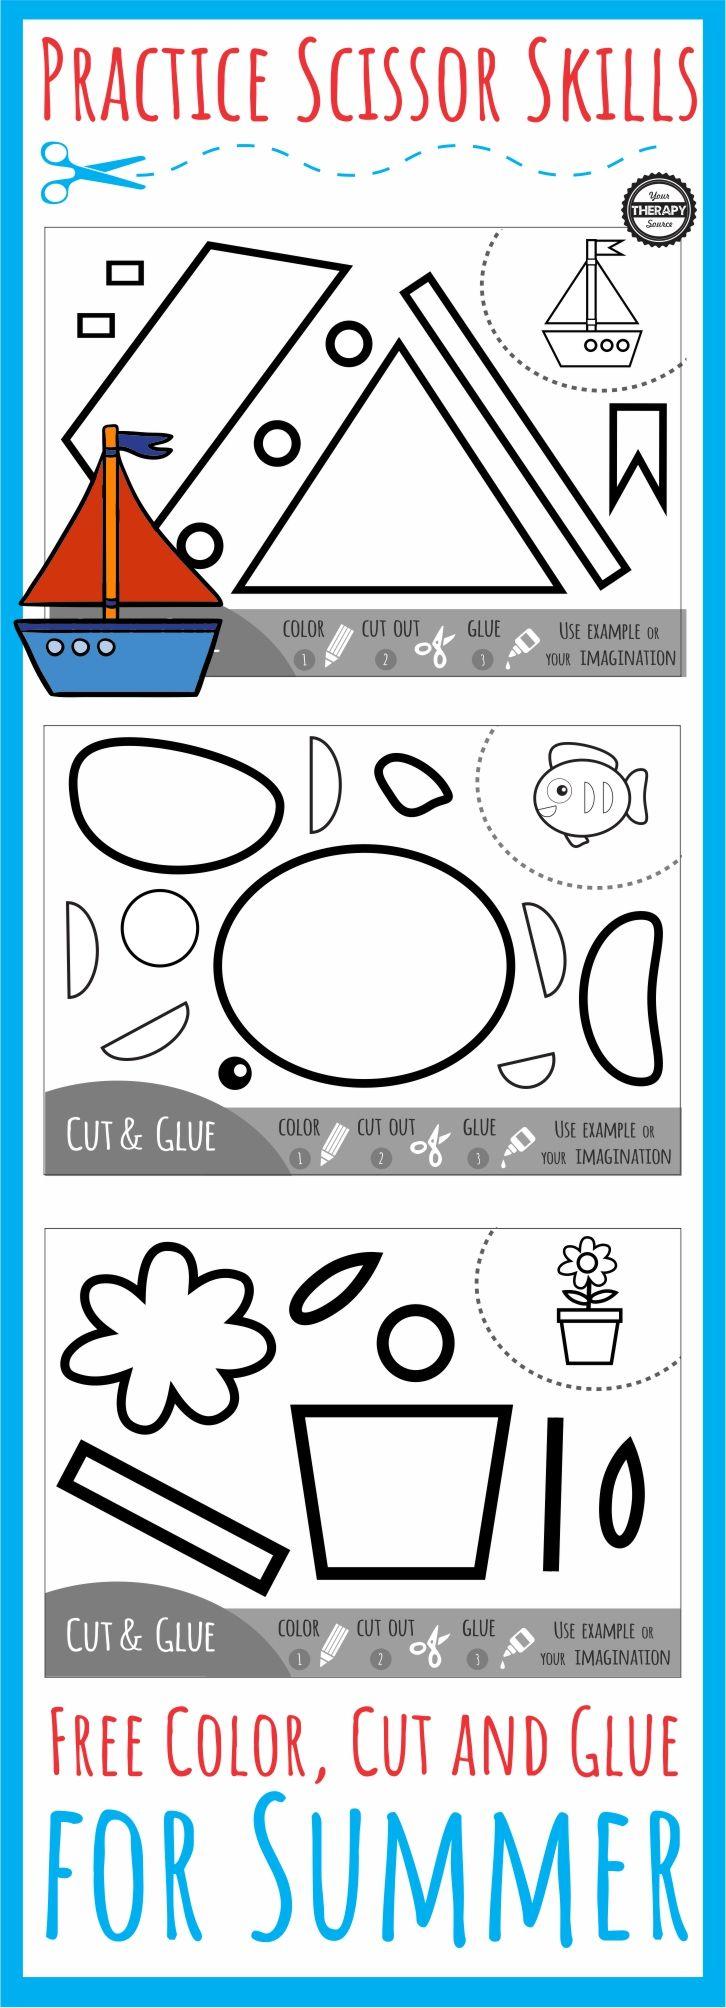 Color Cut Glue Scissor Summer Practice